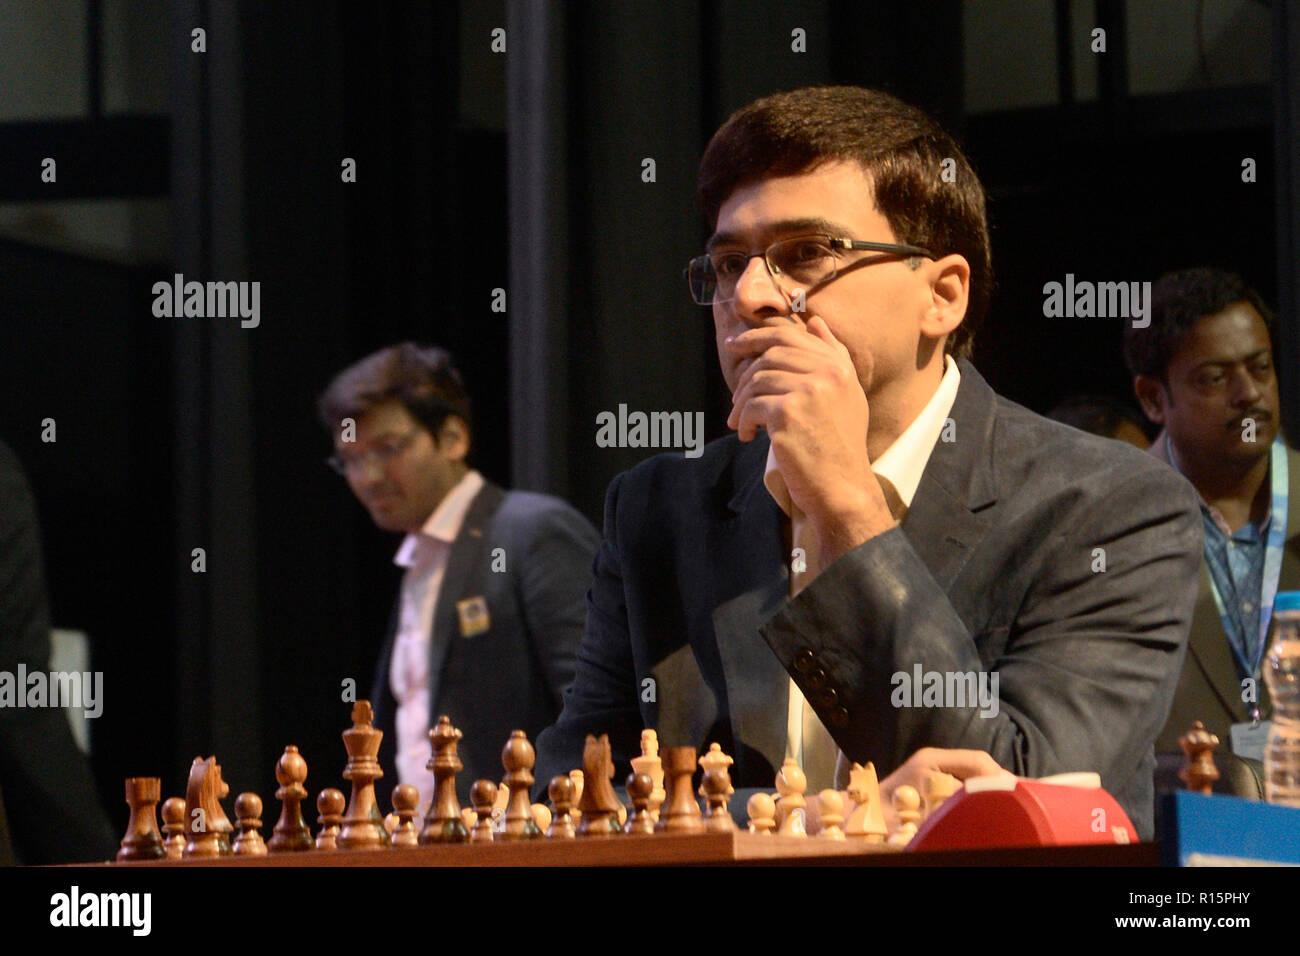 Viswanathan Anand Stock Photos & Viswanathan Anand Stock